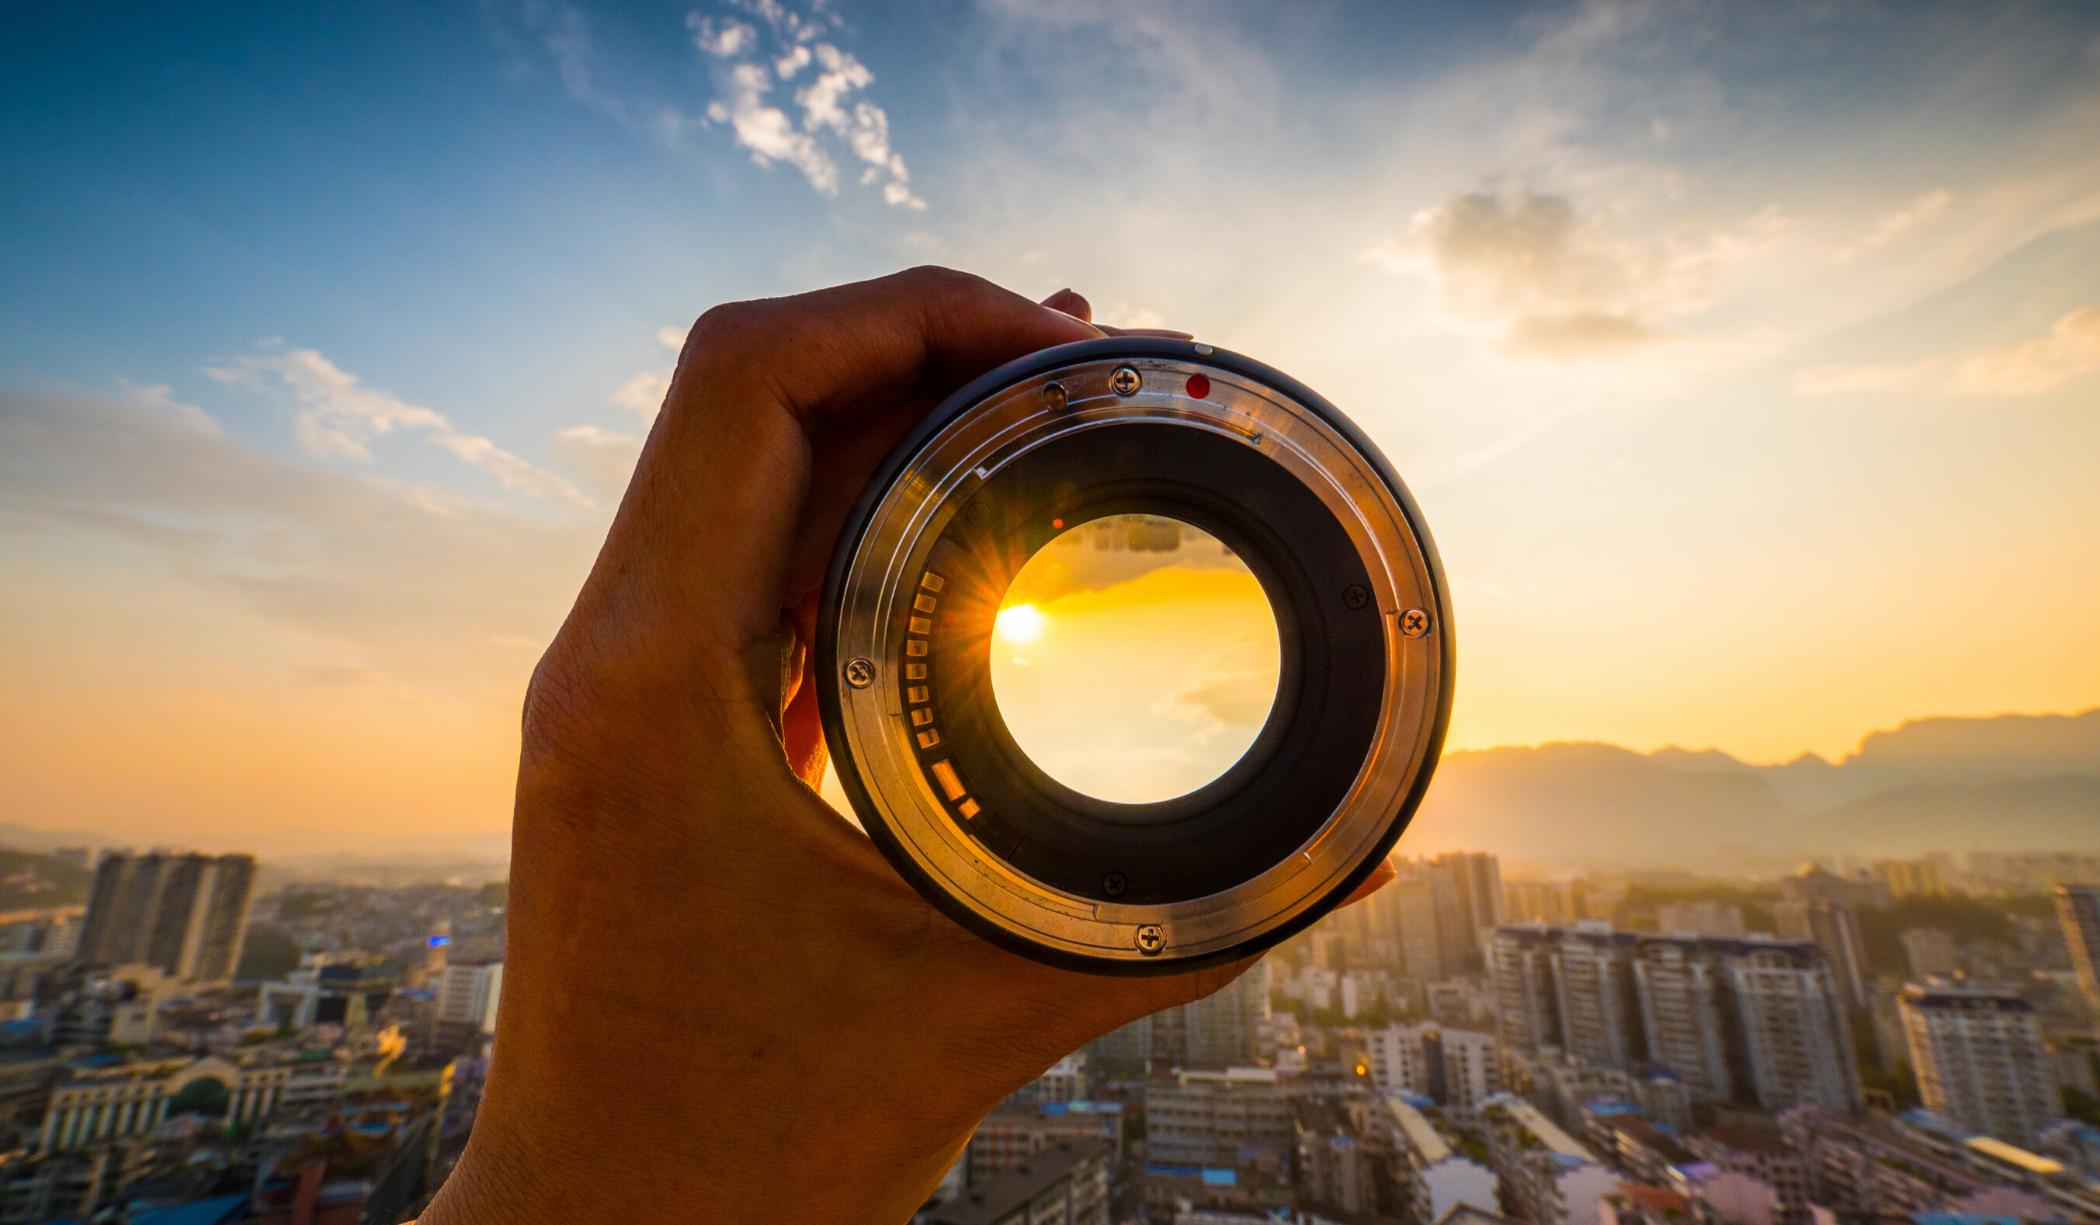 Inbound Marketing through the Lens of the Flywheel